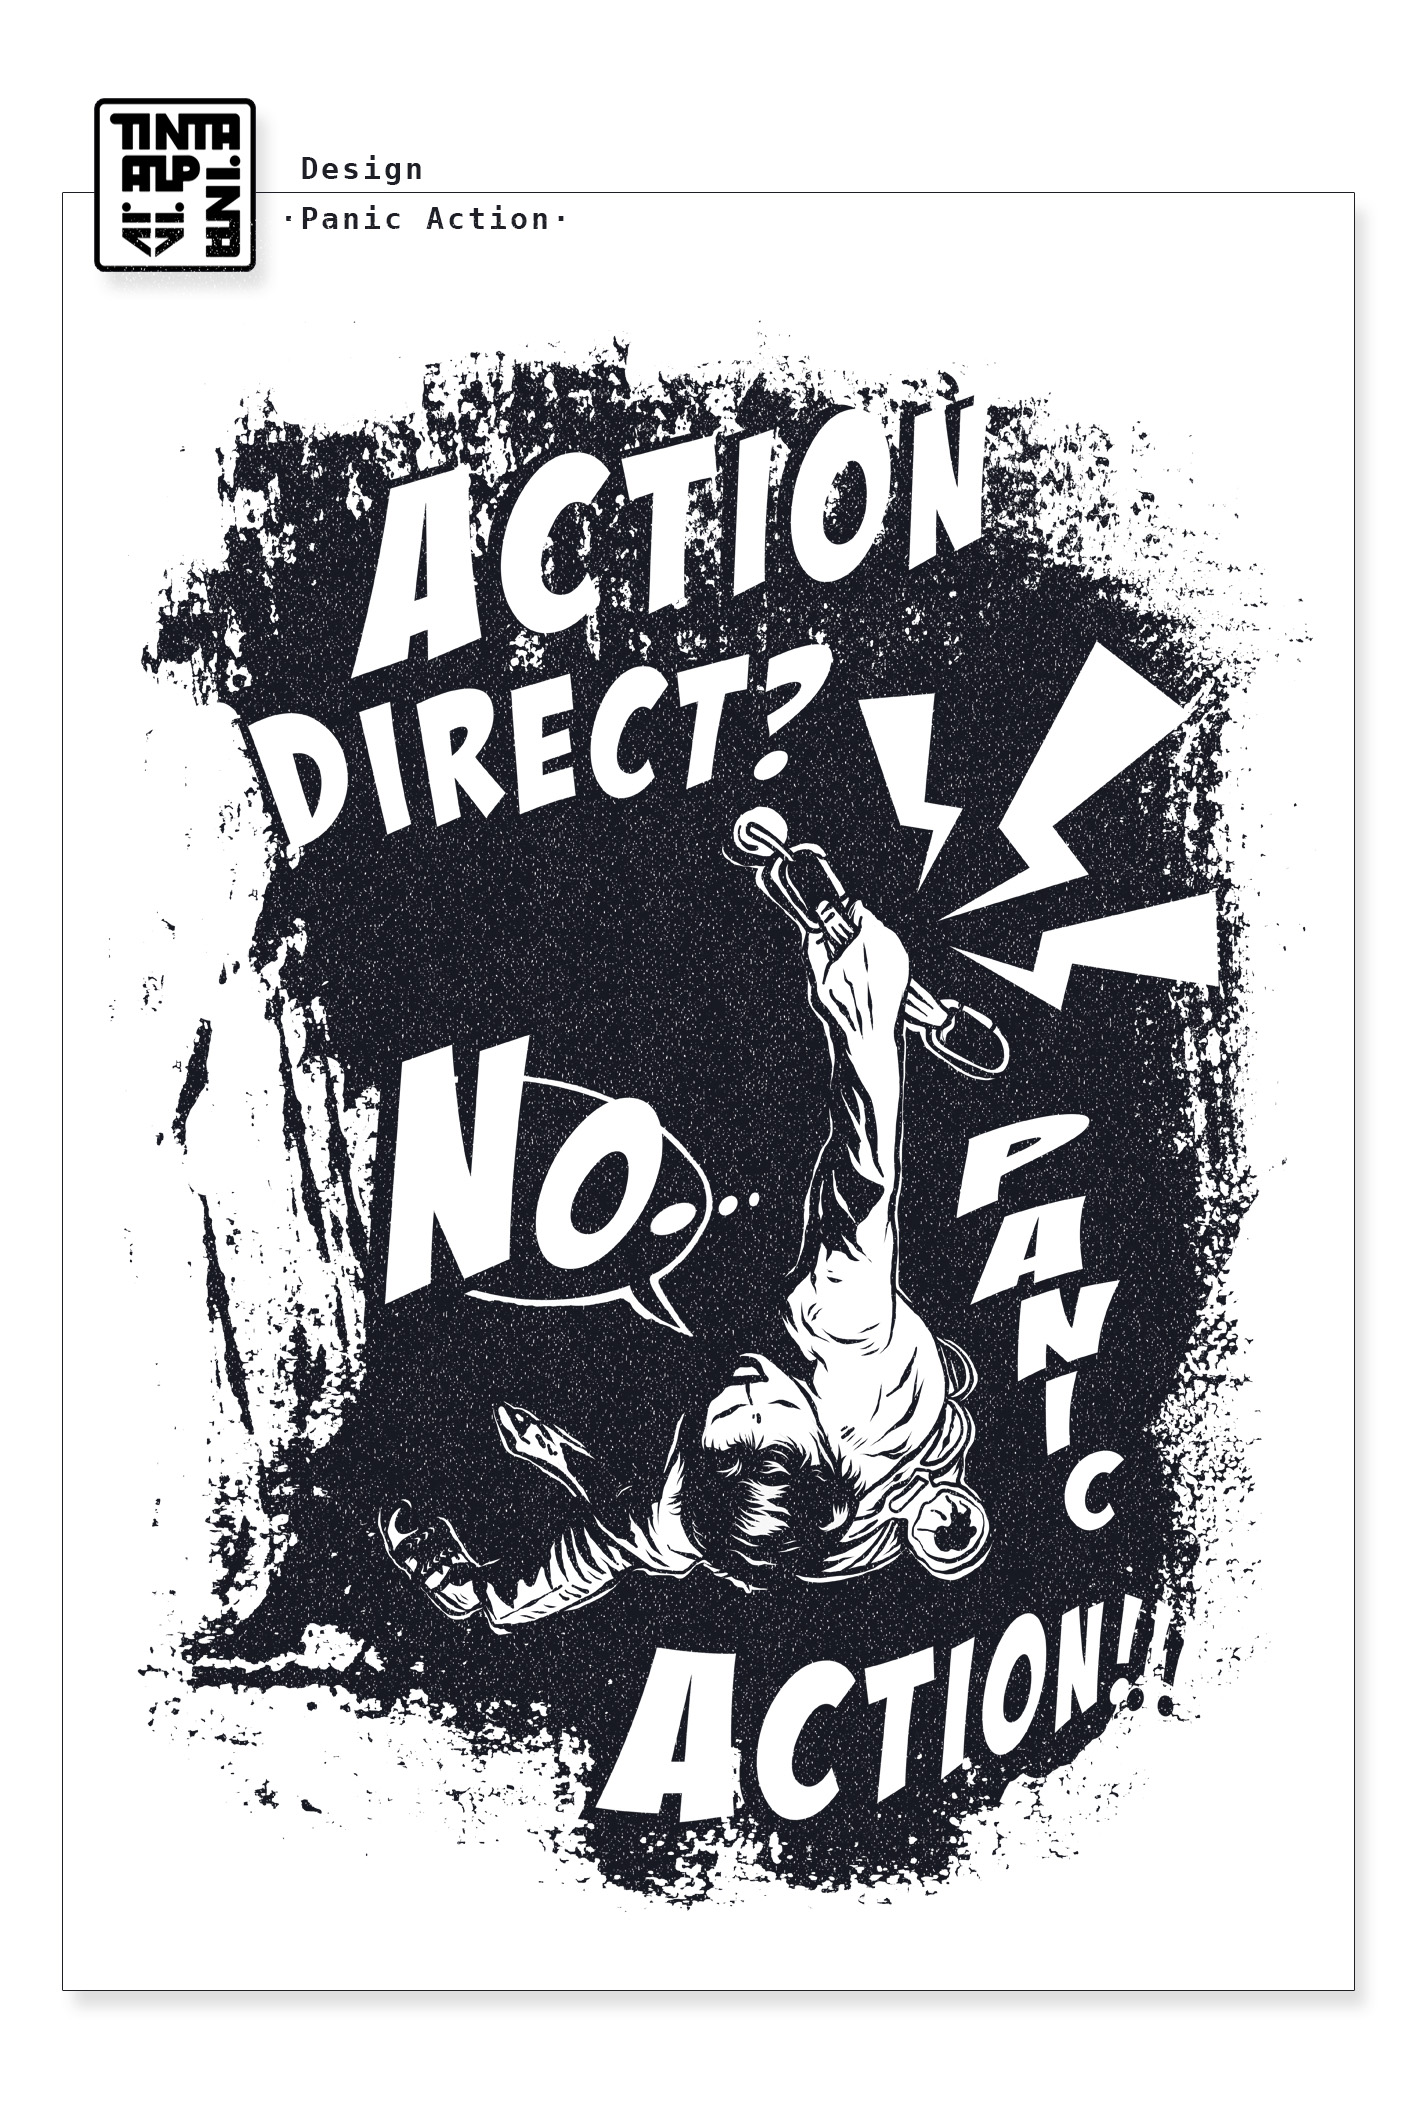 Panic Action